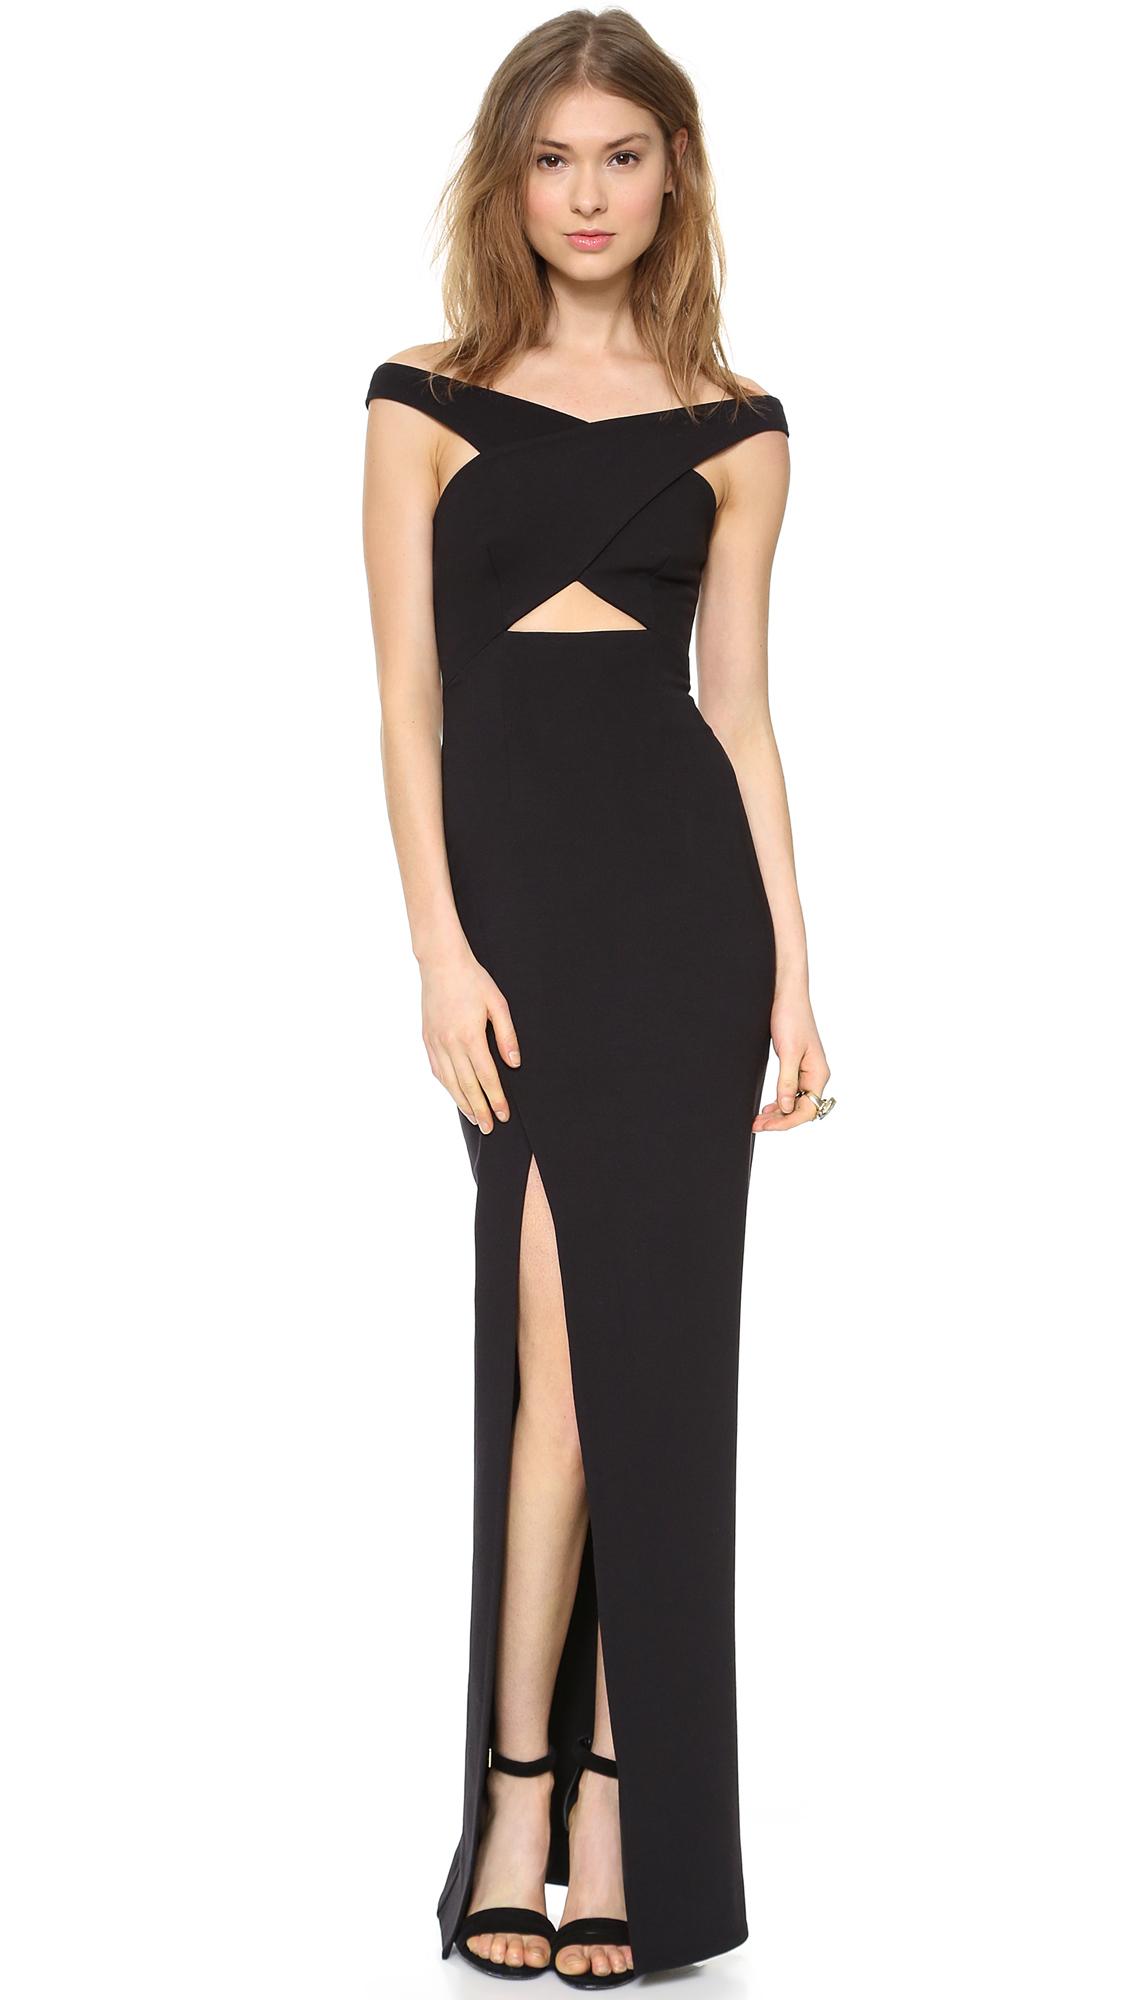 Lyst Nicholas Event Crossover Maxi Dress White In Black